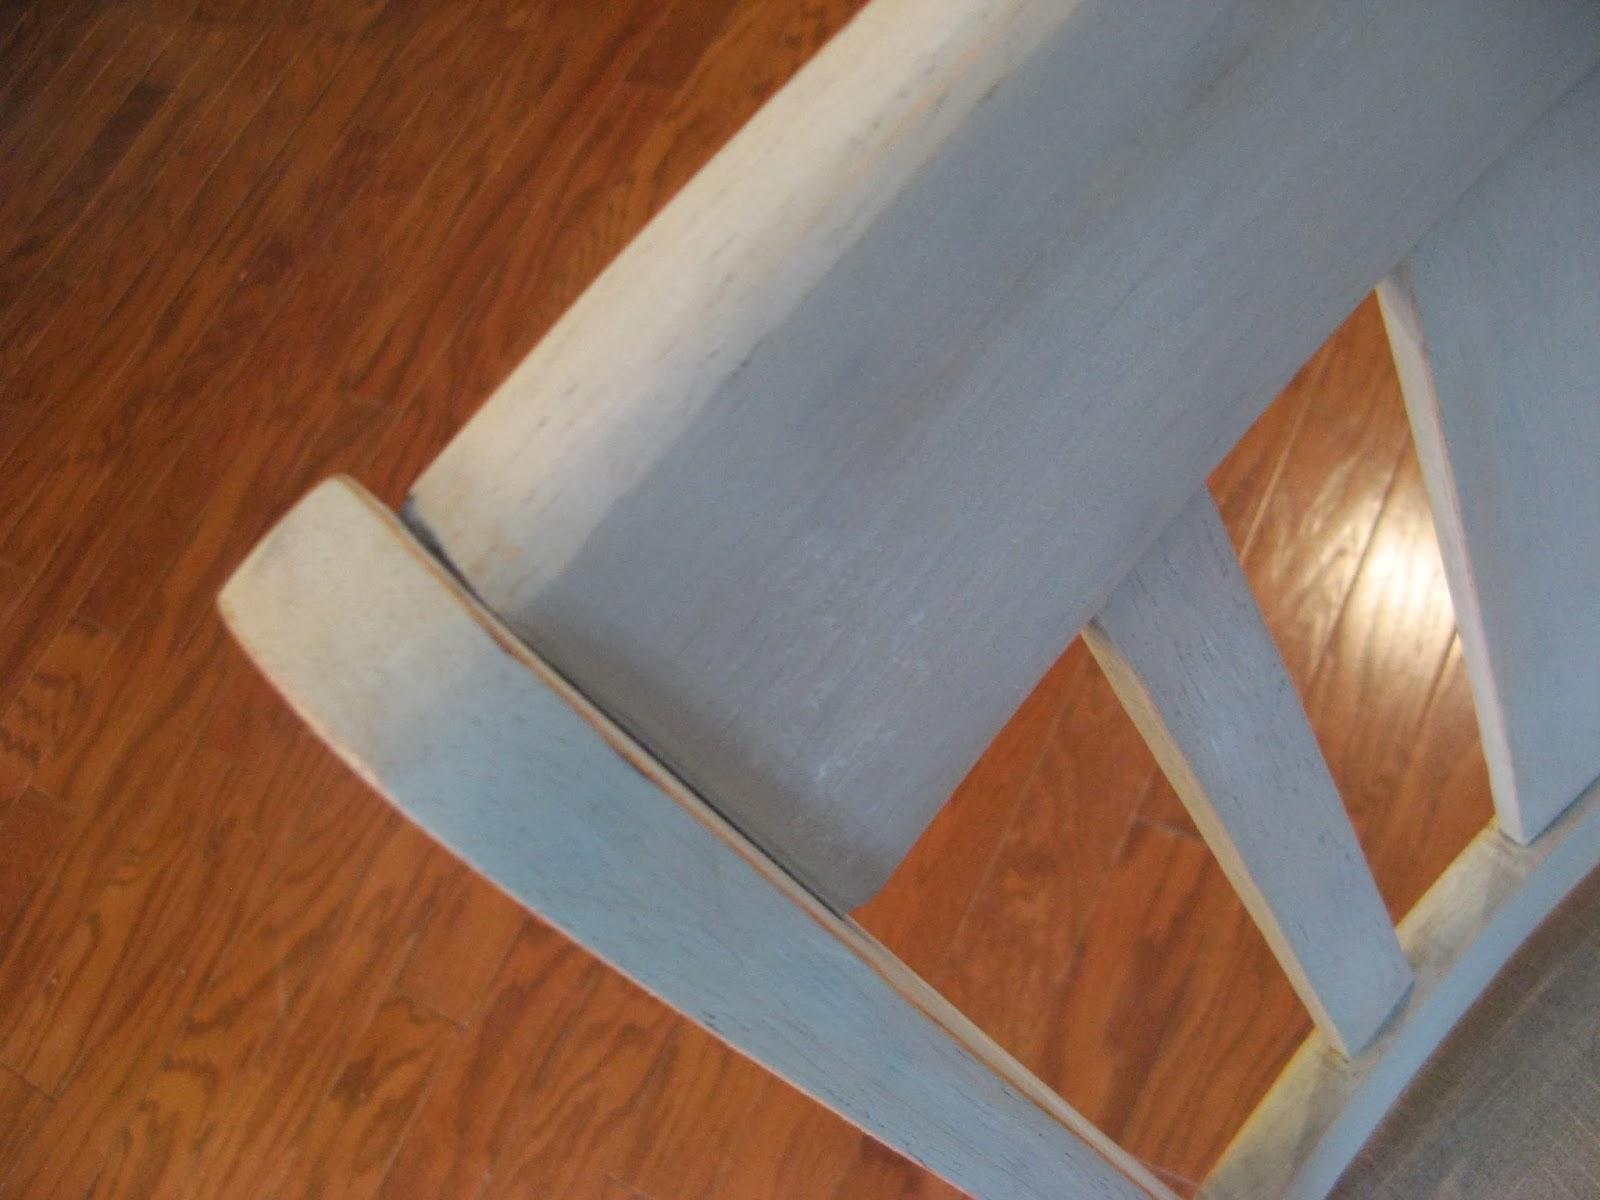 Chair - Driftwood Paint Technique